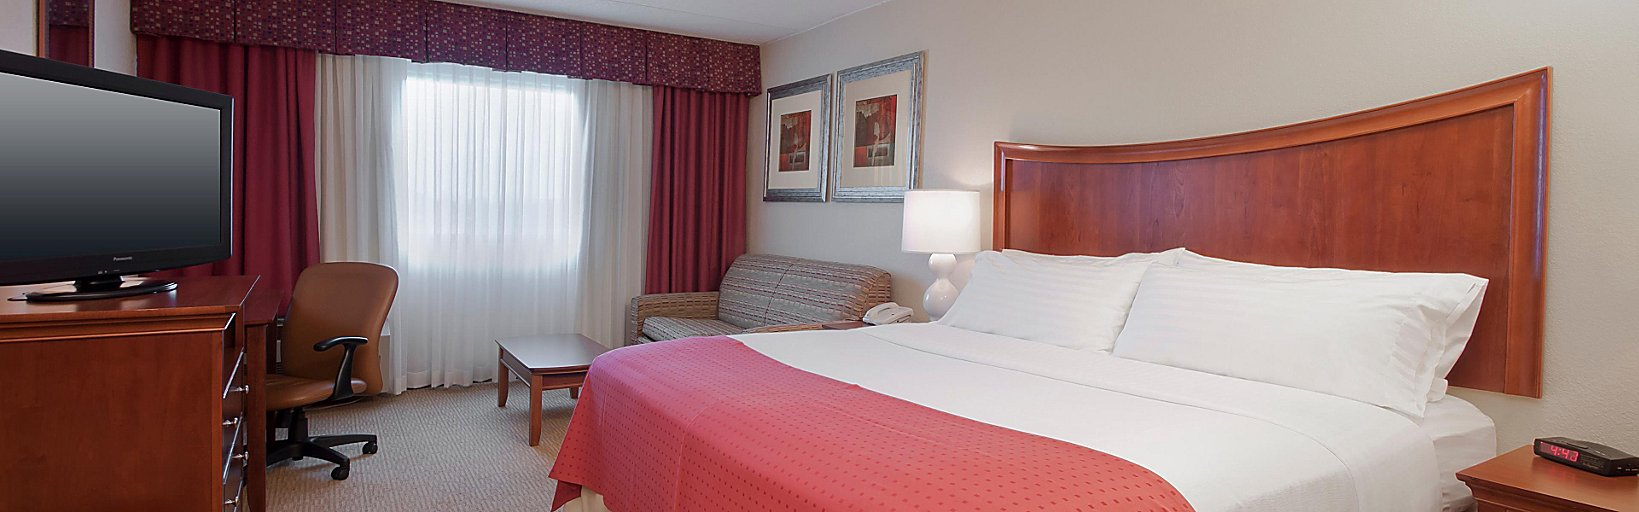 Holiday Inn Flint Hotels Holiday Inn Flint Grand Blanc Area Hotel Room Rates